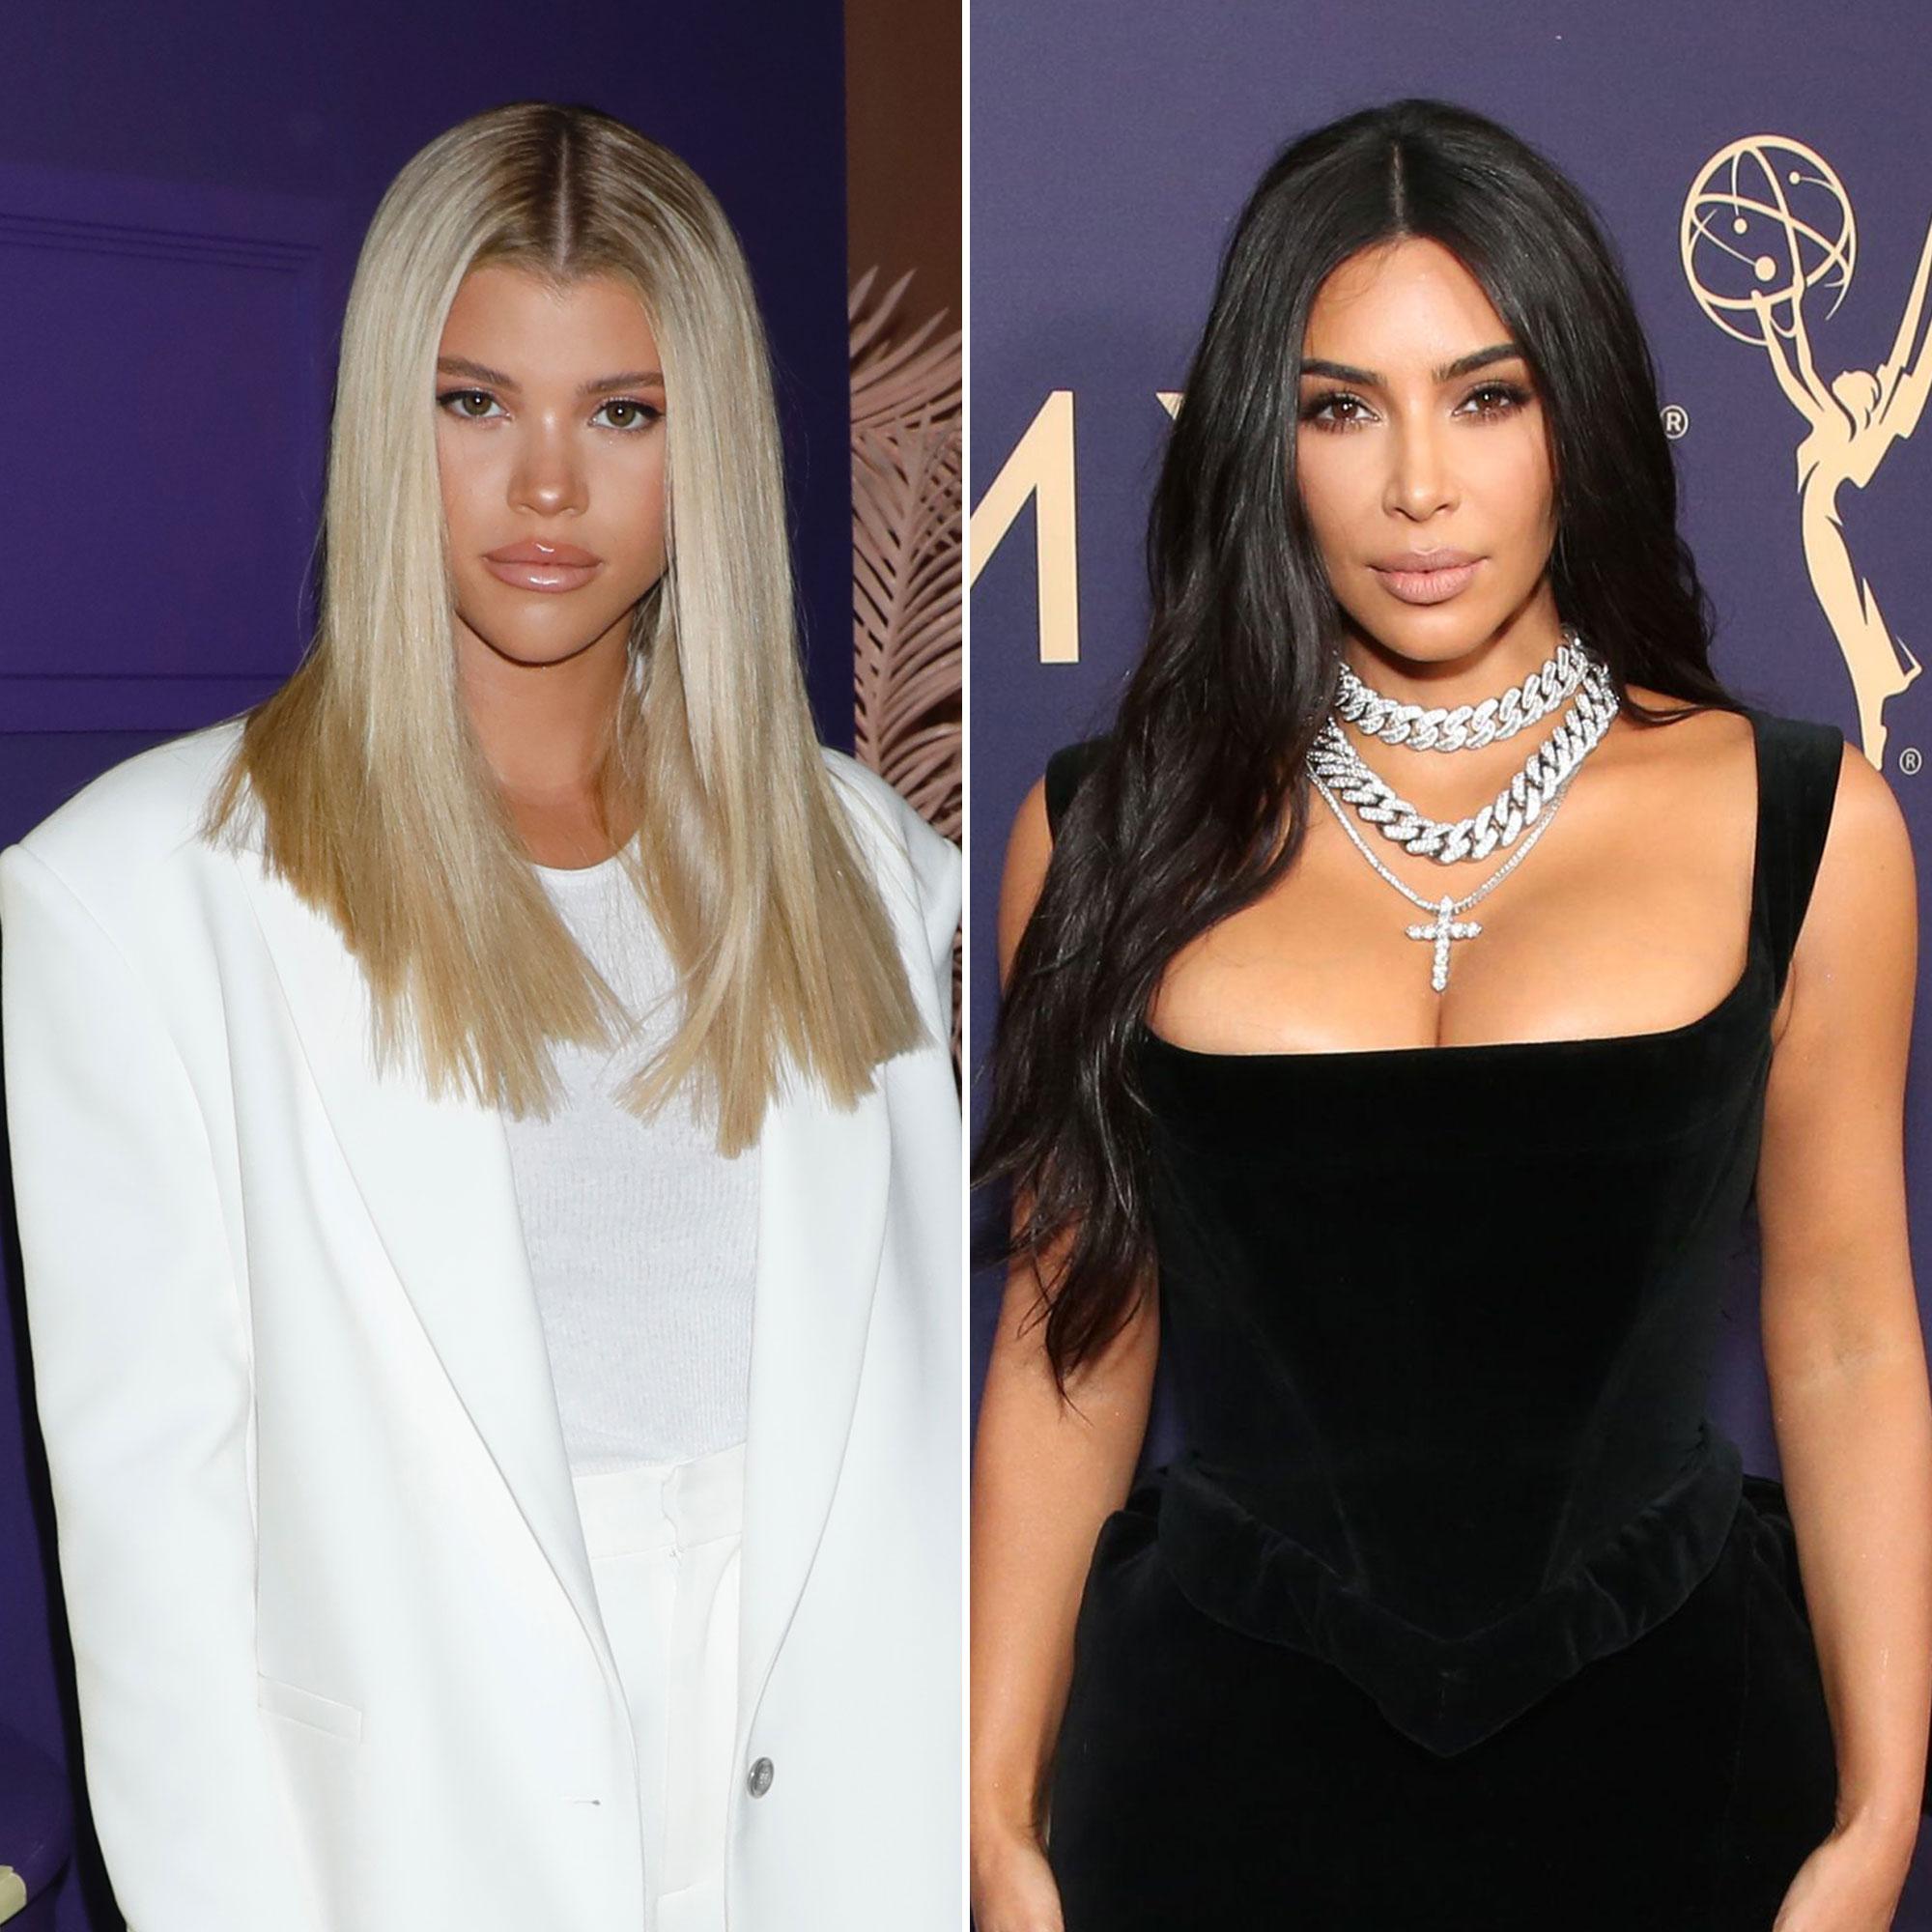 Sofia Richie Publicly Supports Kim Kardashian's New Skims Line: 'So Good'